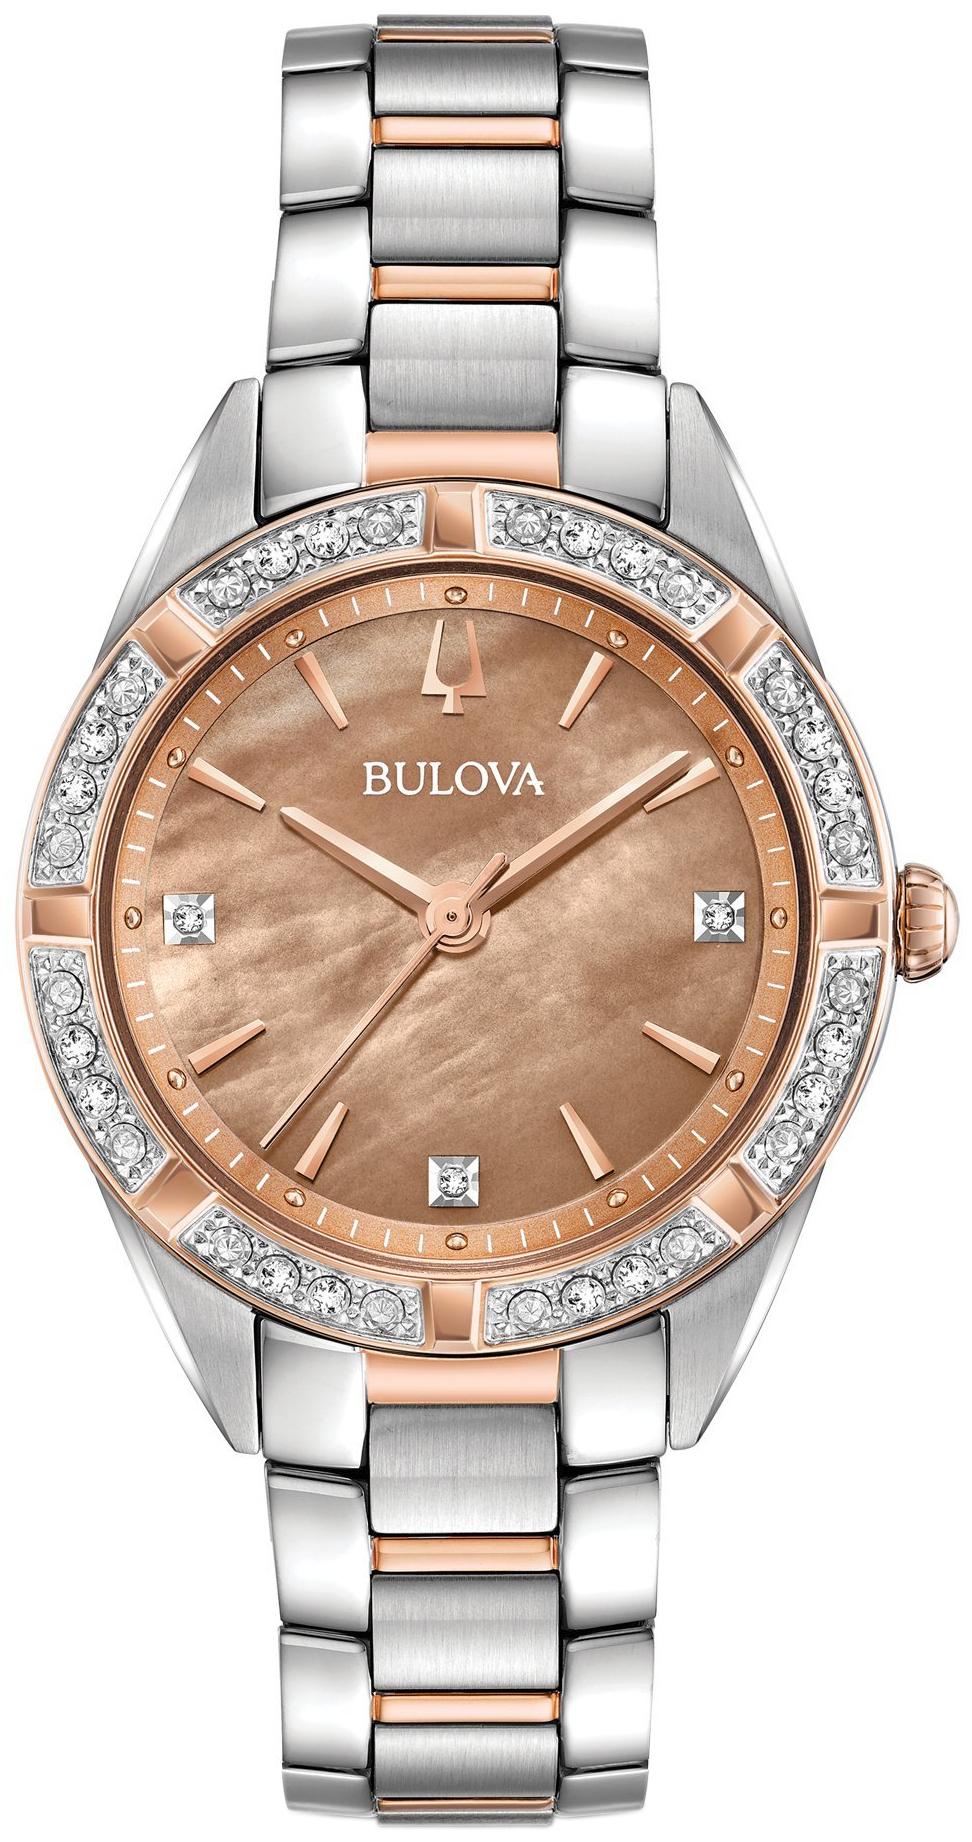 Bulova Diamond Dameklokke 98R264 Bronsefarget/Rose-gulltonet stål - Bulova